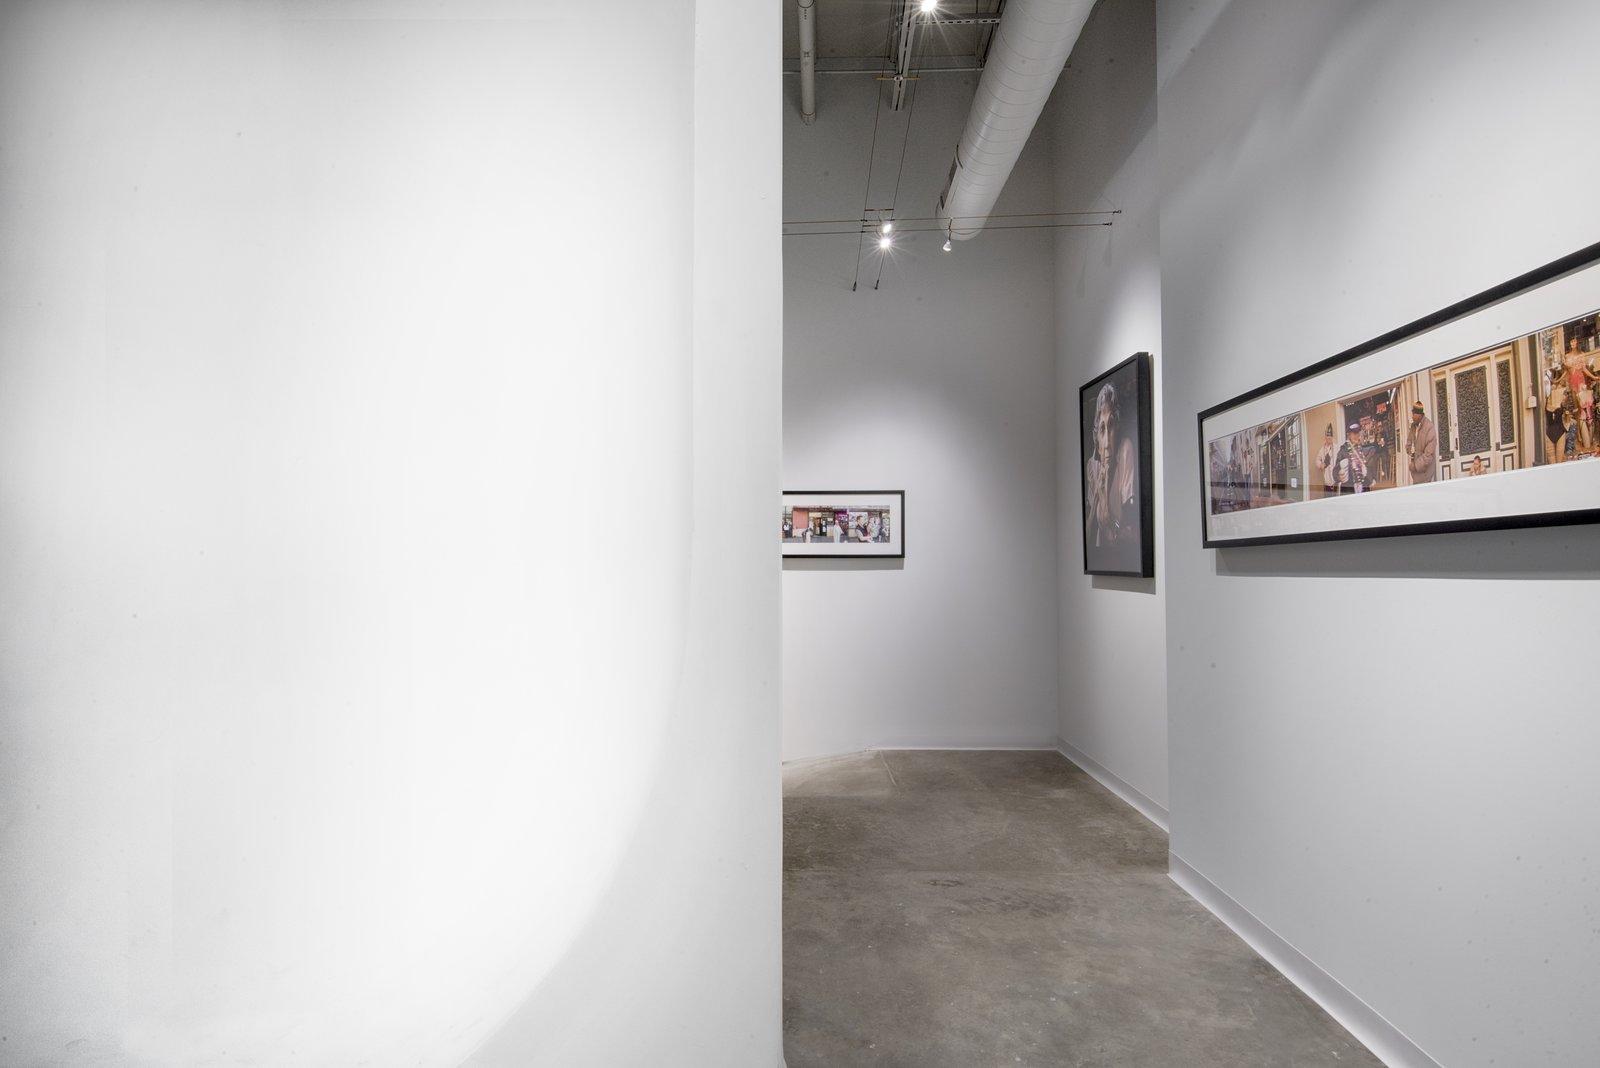 Studio gallery wall, cyclorama wall.